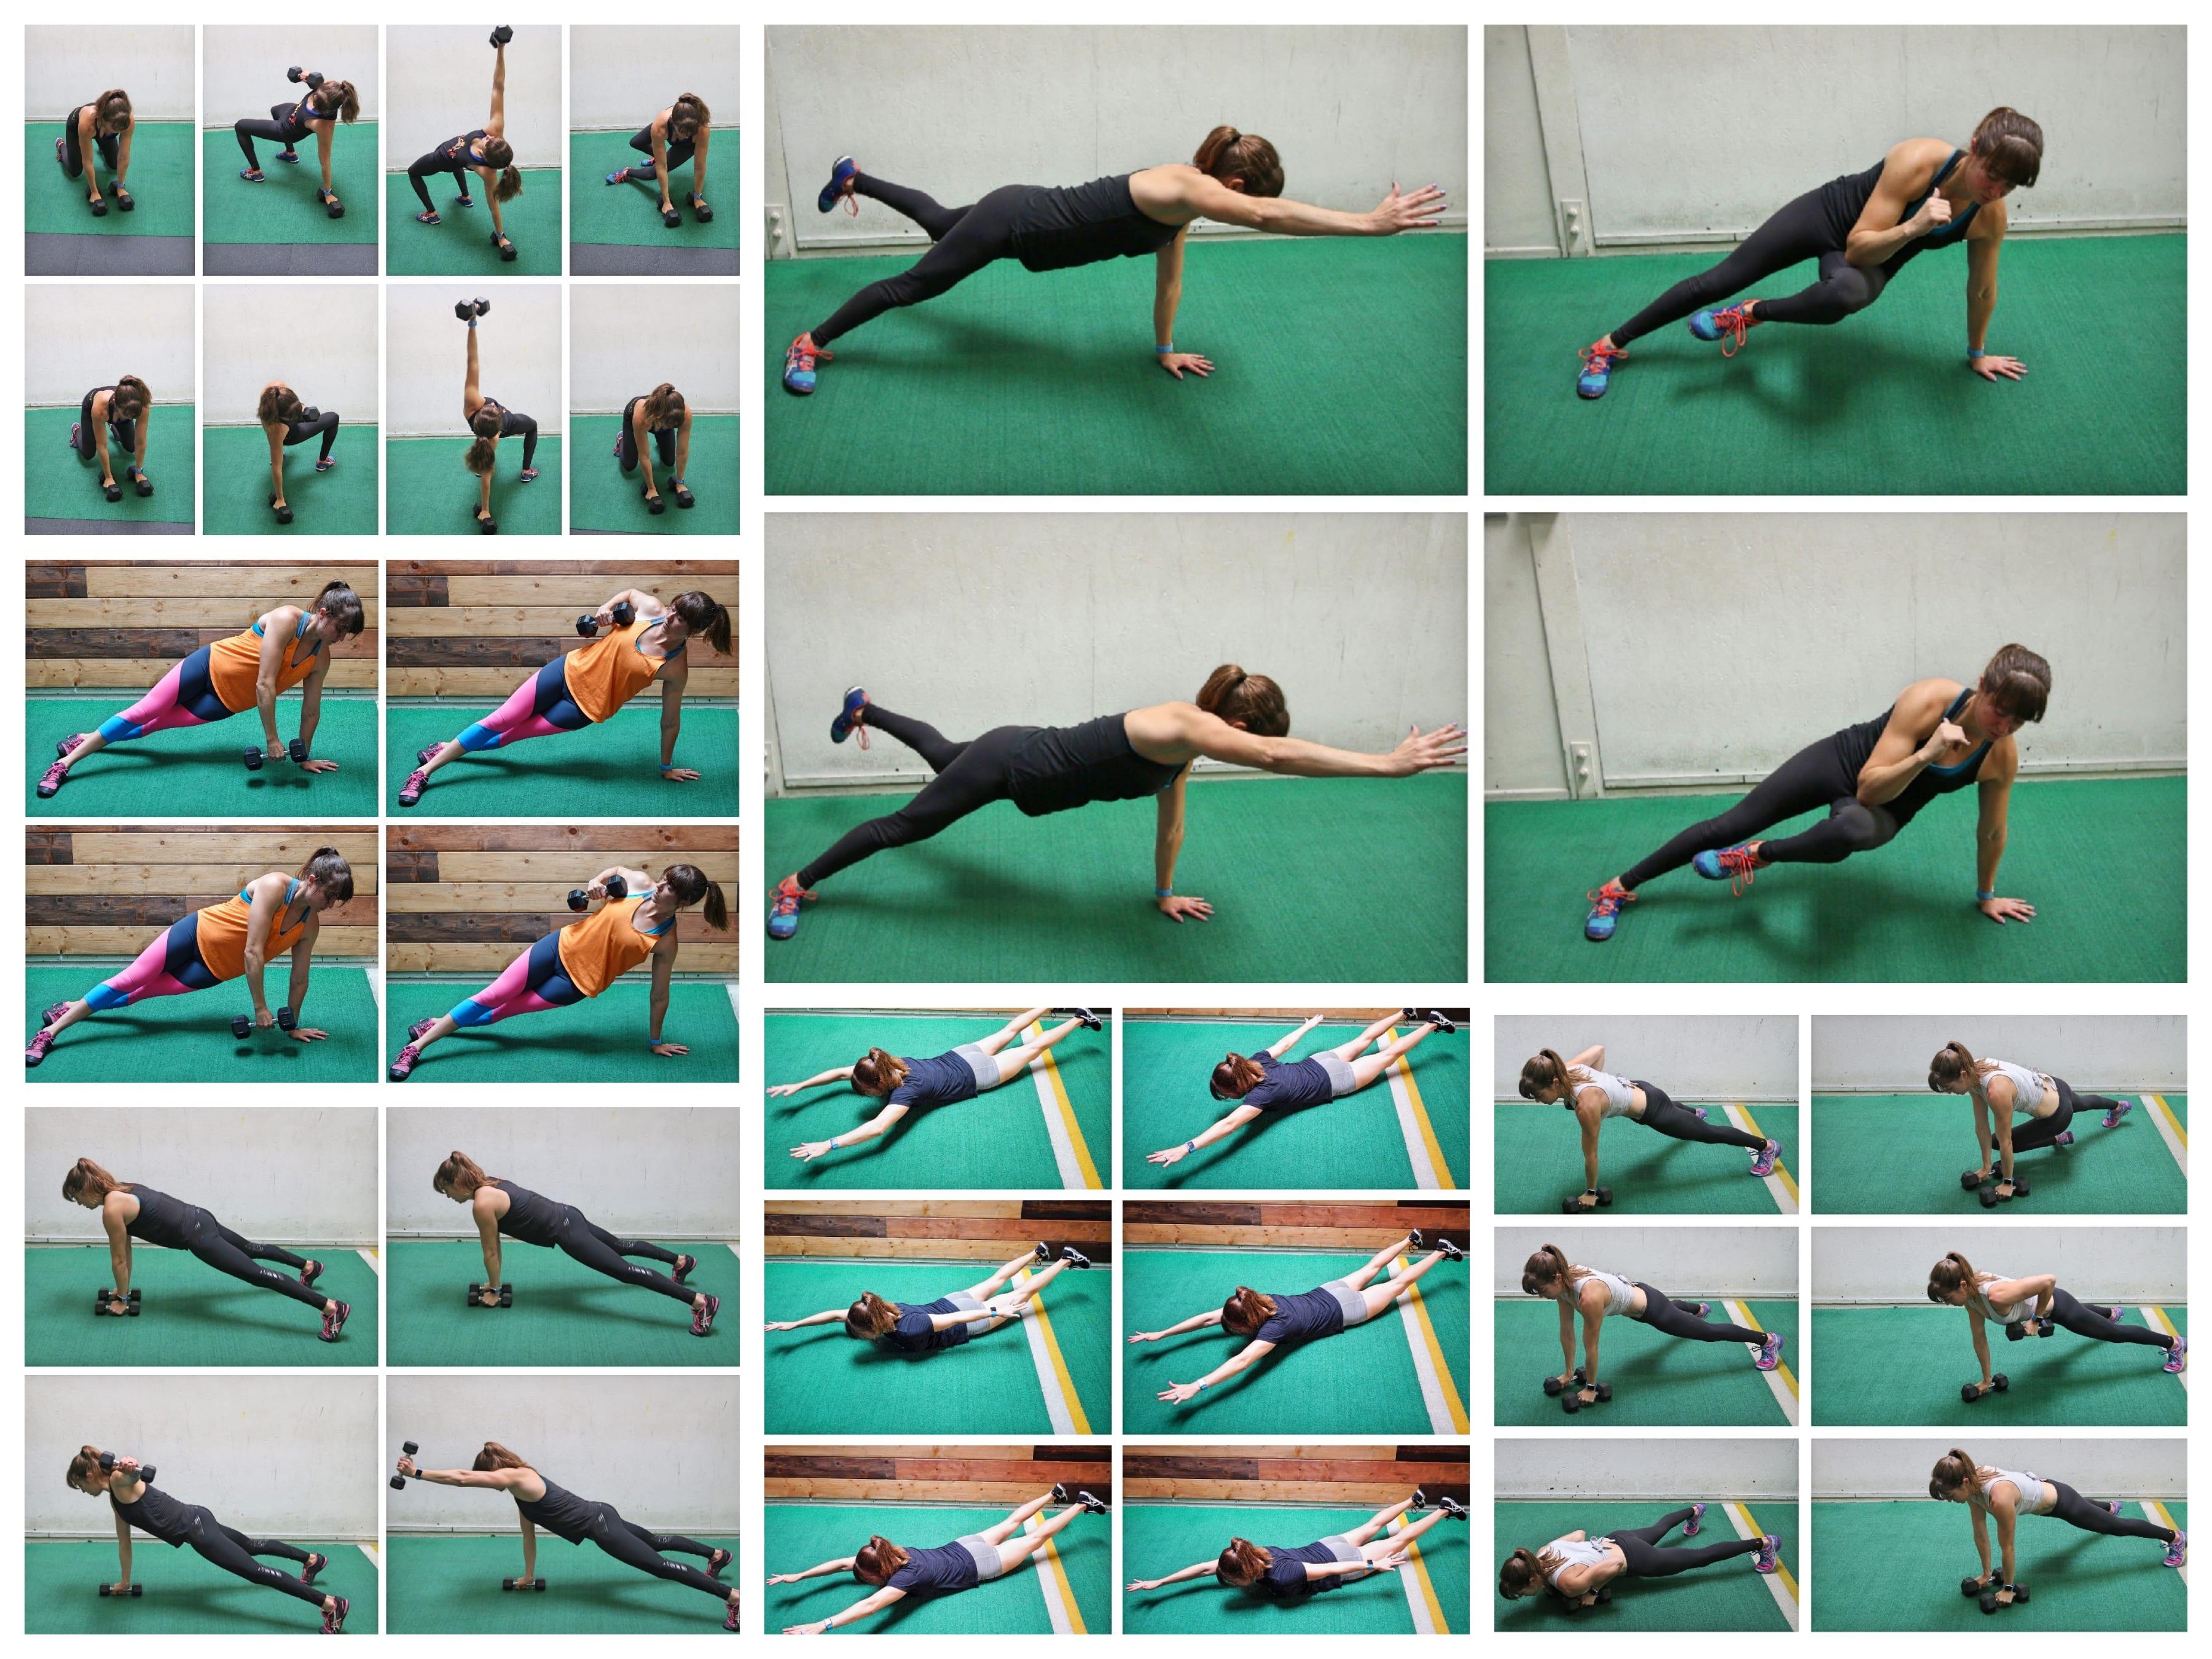 12 Hybrid Upper Body Moves To Build Killer Upper Body And Core Strength